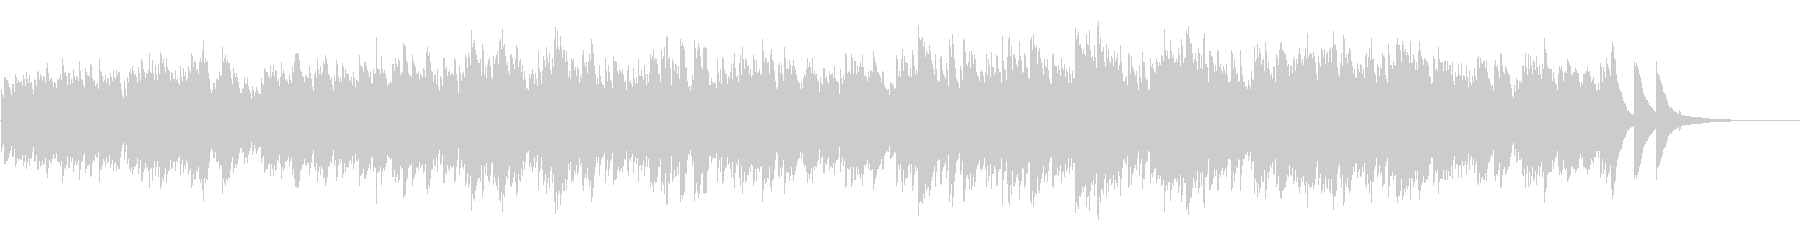 AppleのCMをイメージしたピアノ曲の未再生の波形